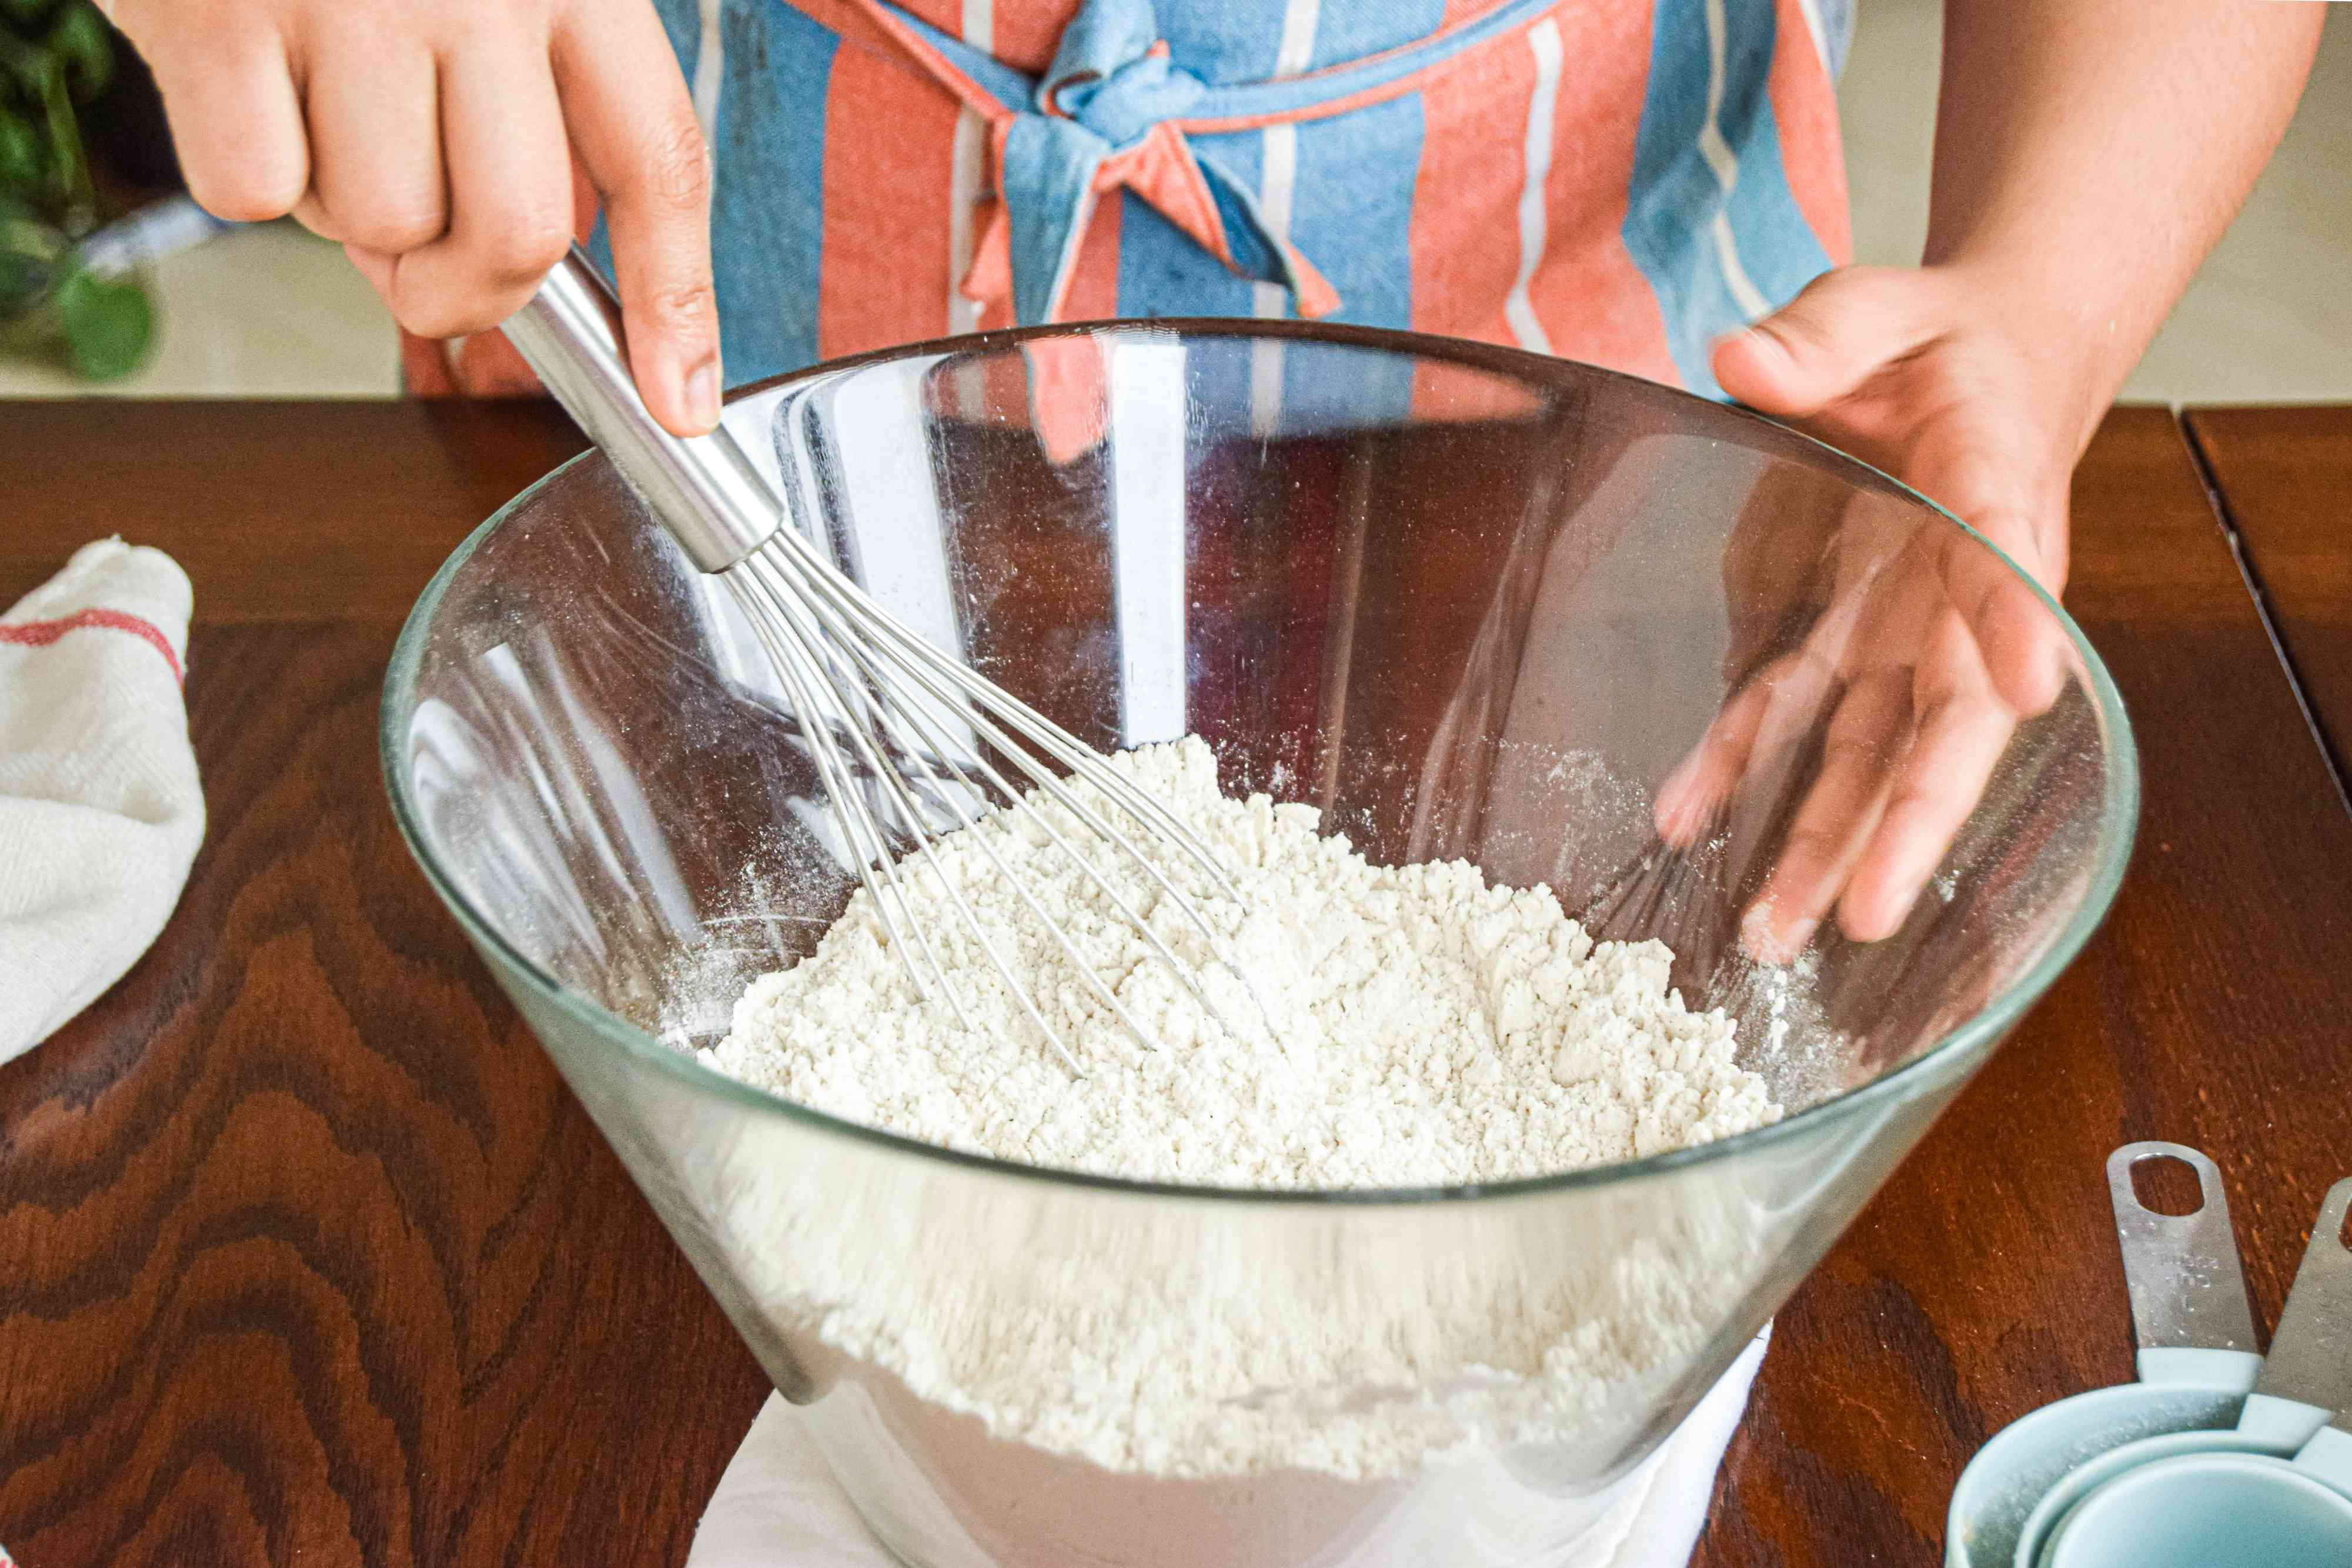 Whisking flour mixture in a bowl to make a hummingbird cake recipe.